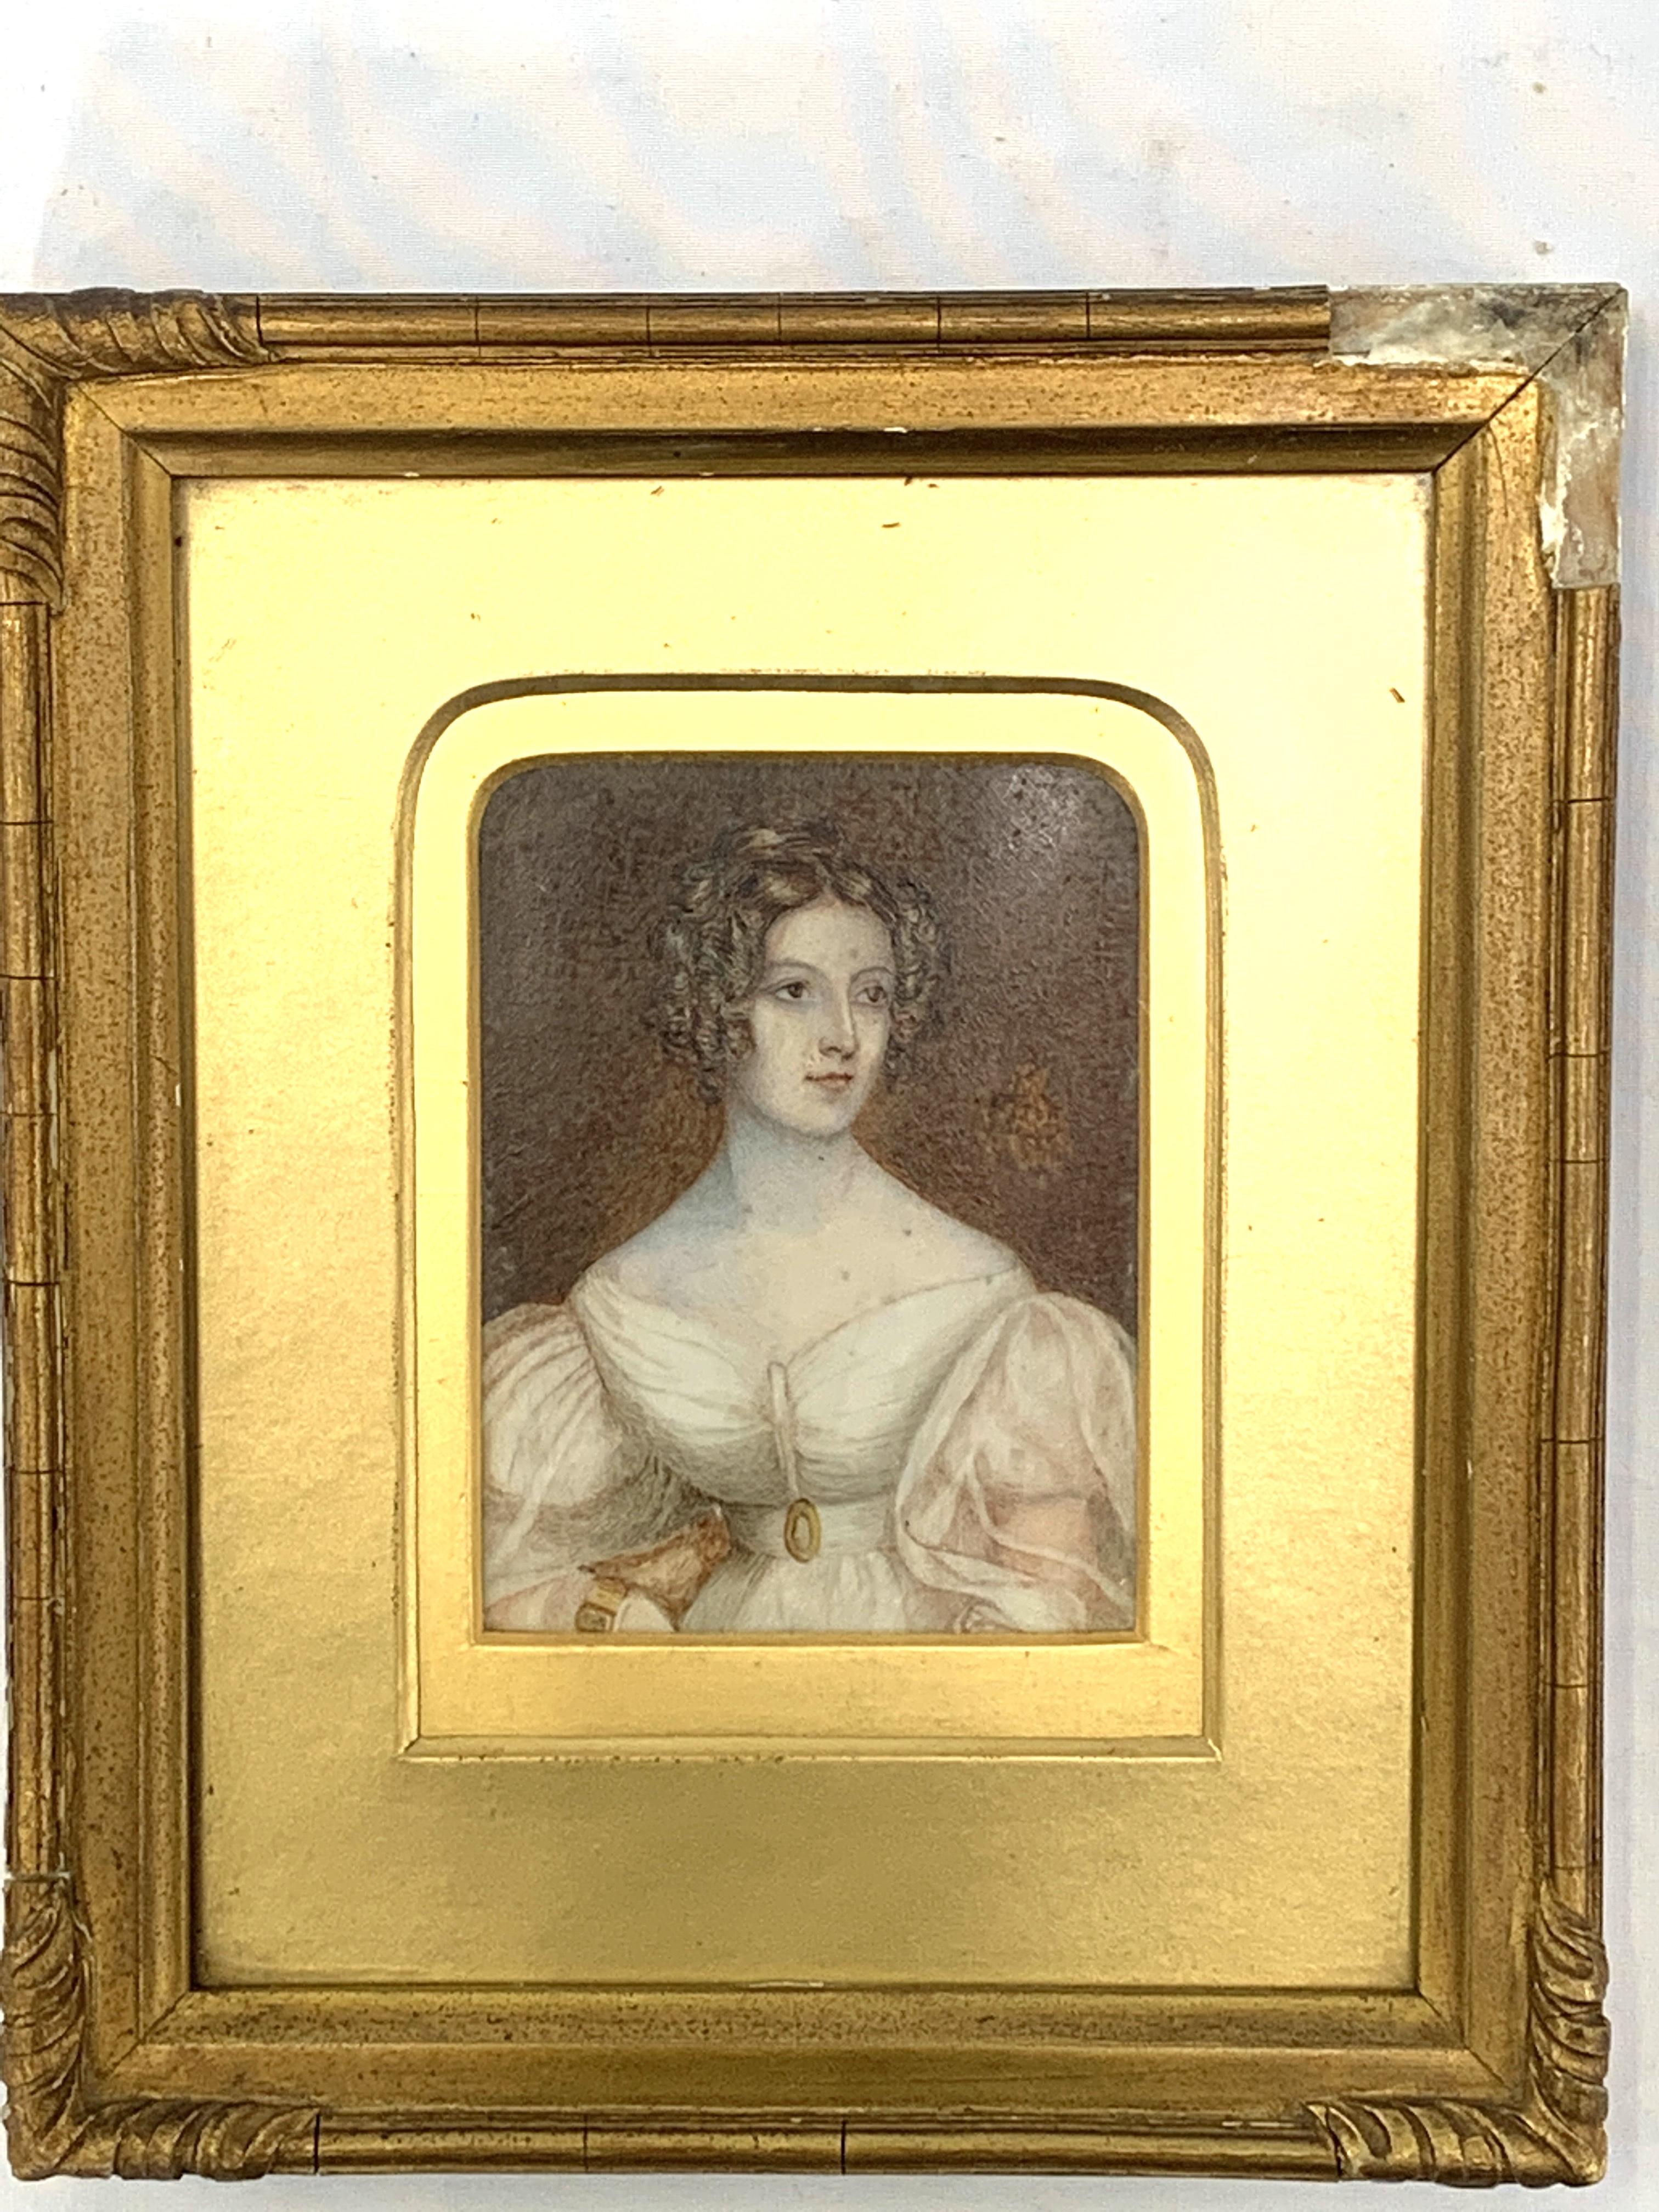 Gilt framed and glazed miniature oil portrait of a lady